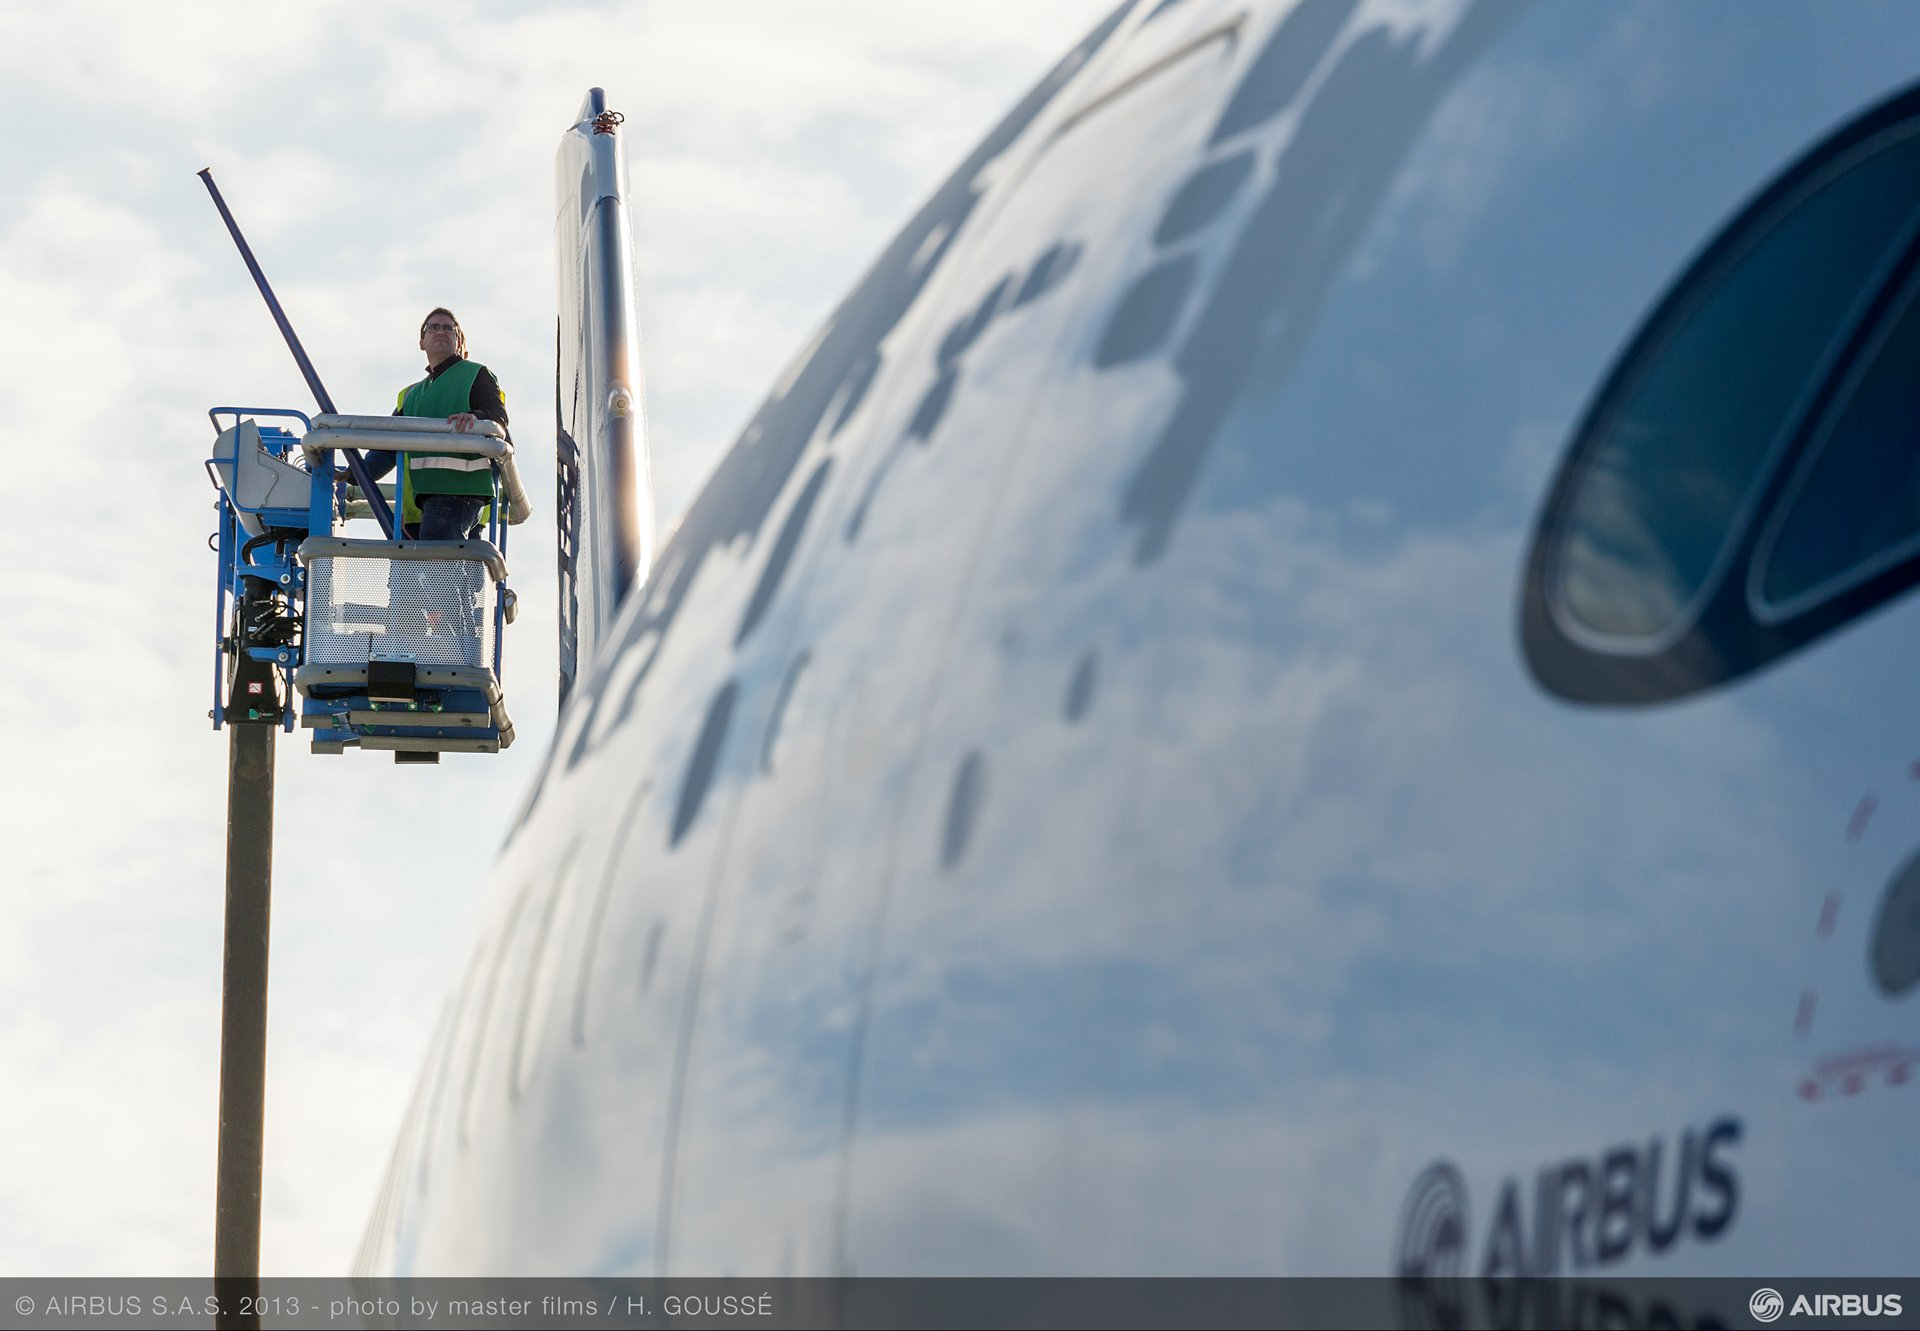 Flight Hour Services (FHS) Components